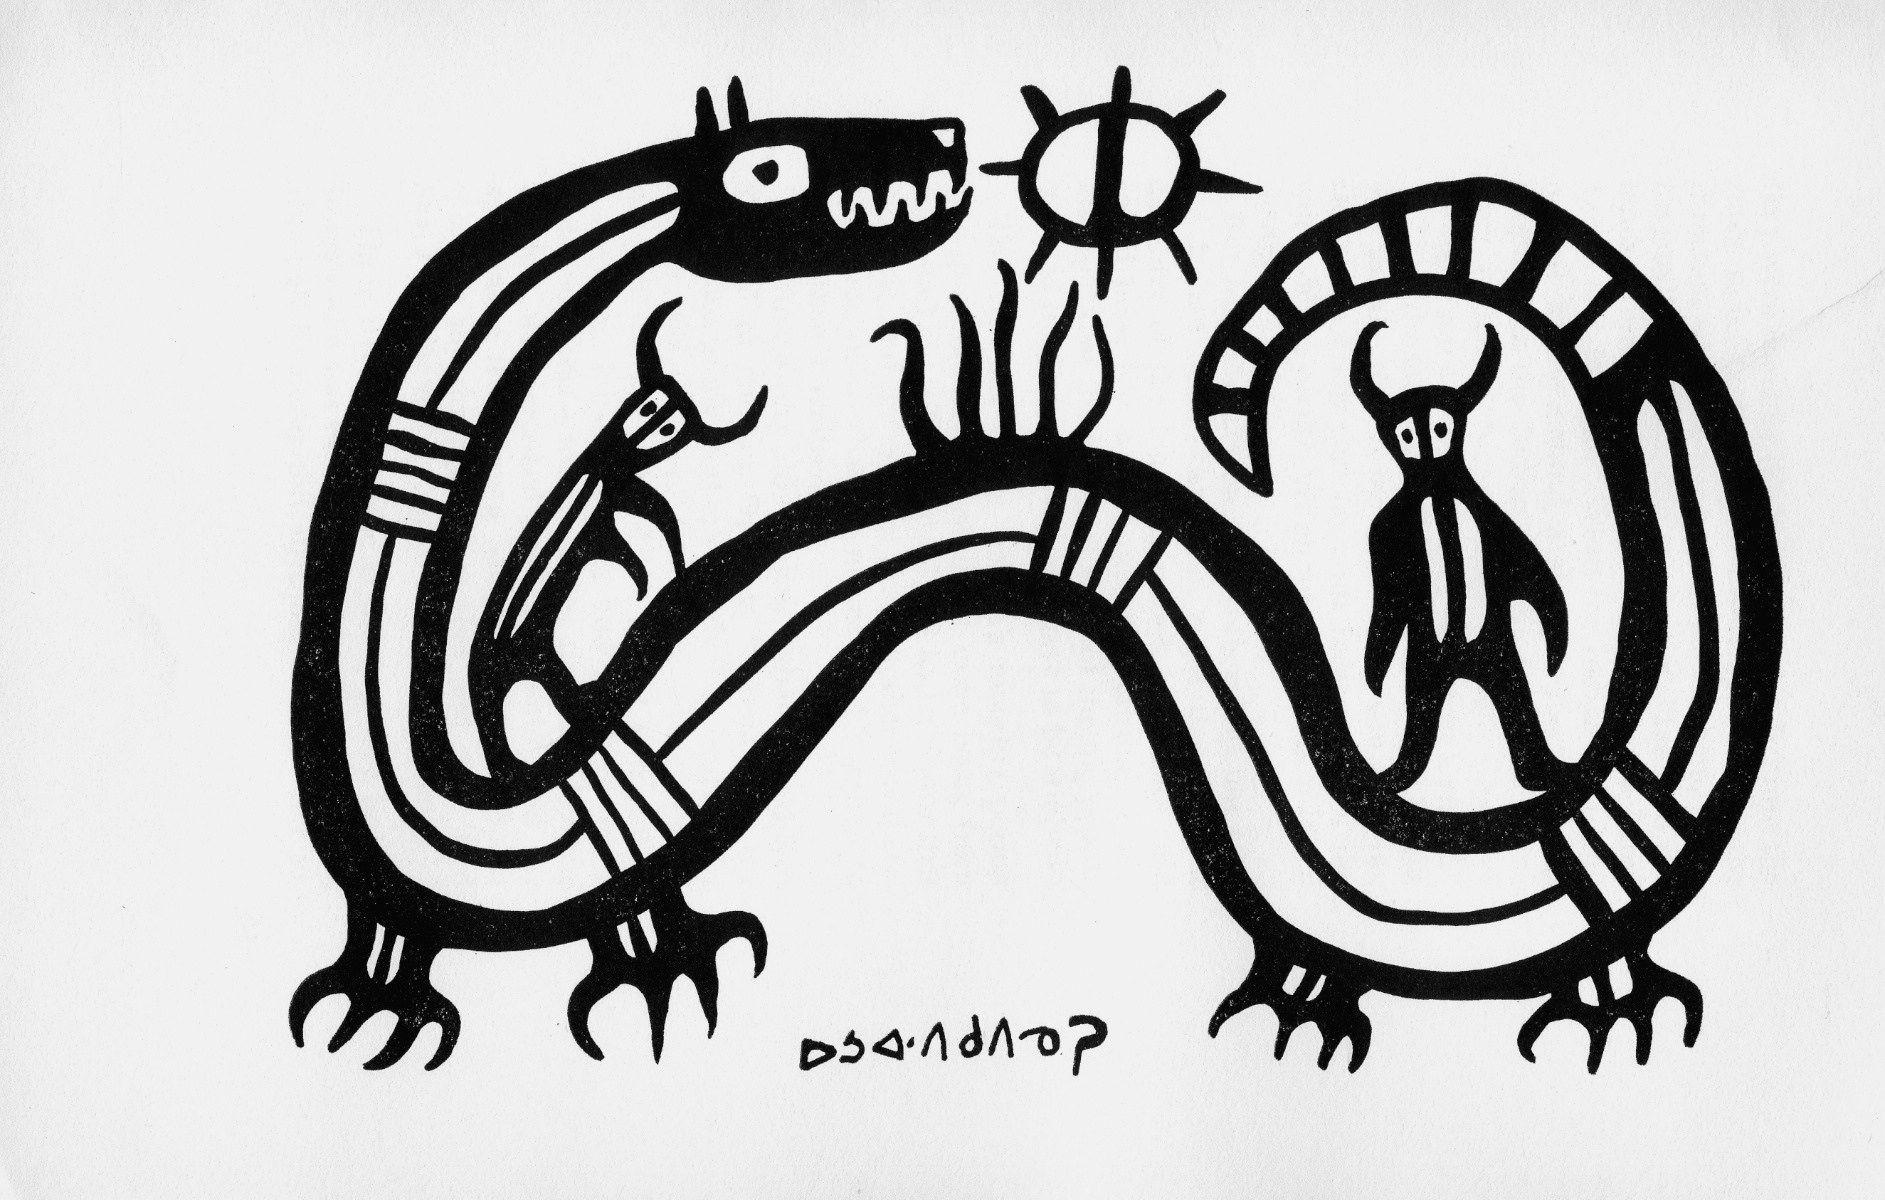 49c3fe9e1b76f213c6170f7292aeb378 Jpg 1885 1200 Inuit Art Pictograph Book Art